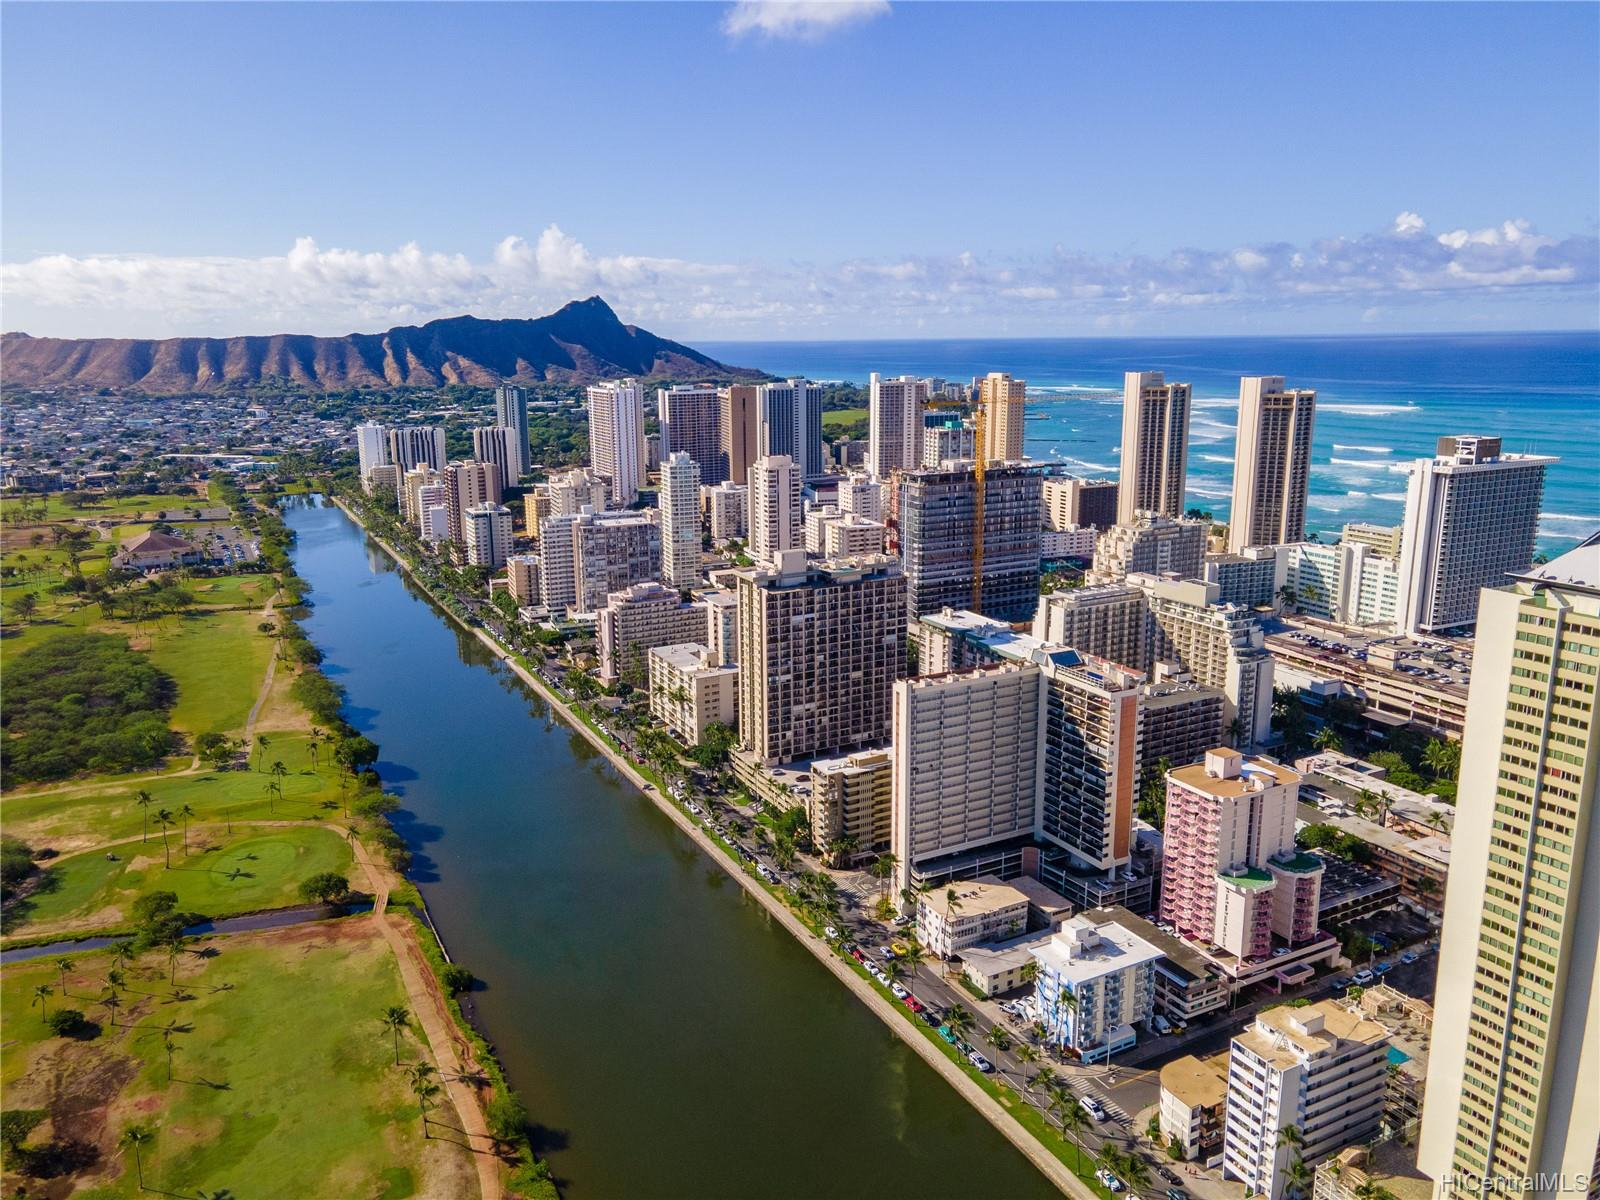 2319 Ala Wai Blvd Honolulu Oahu commercial real estate photo10 of 21